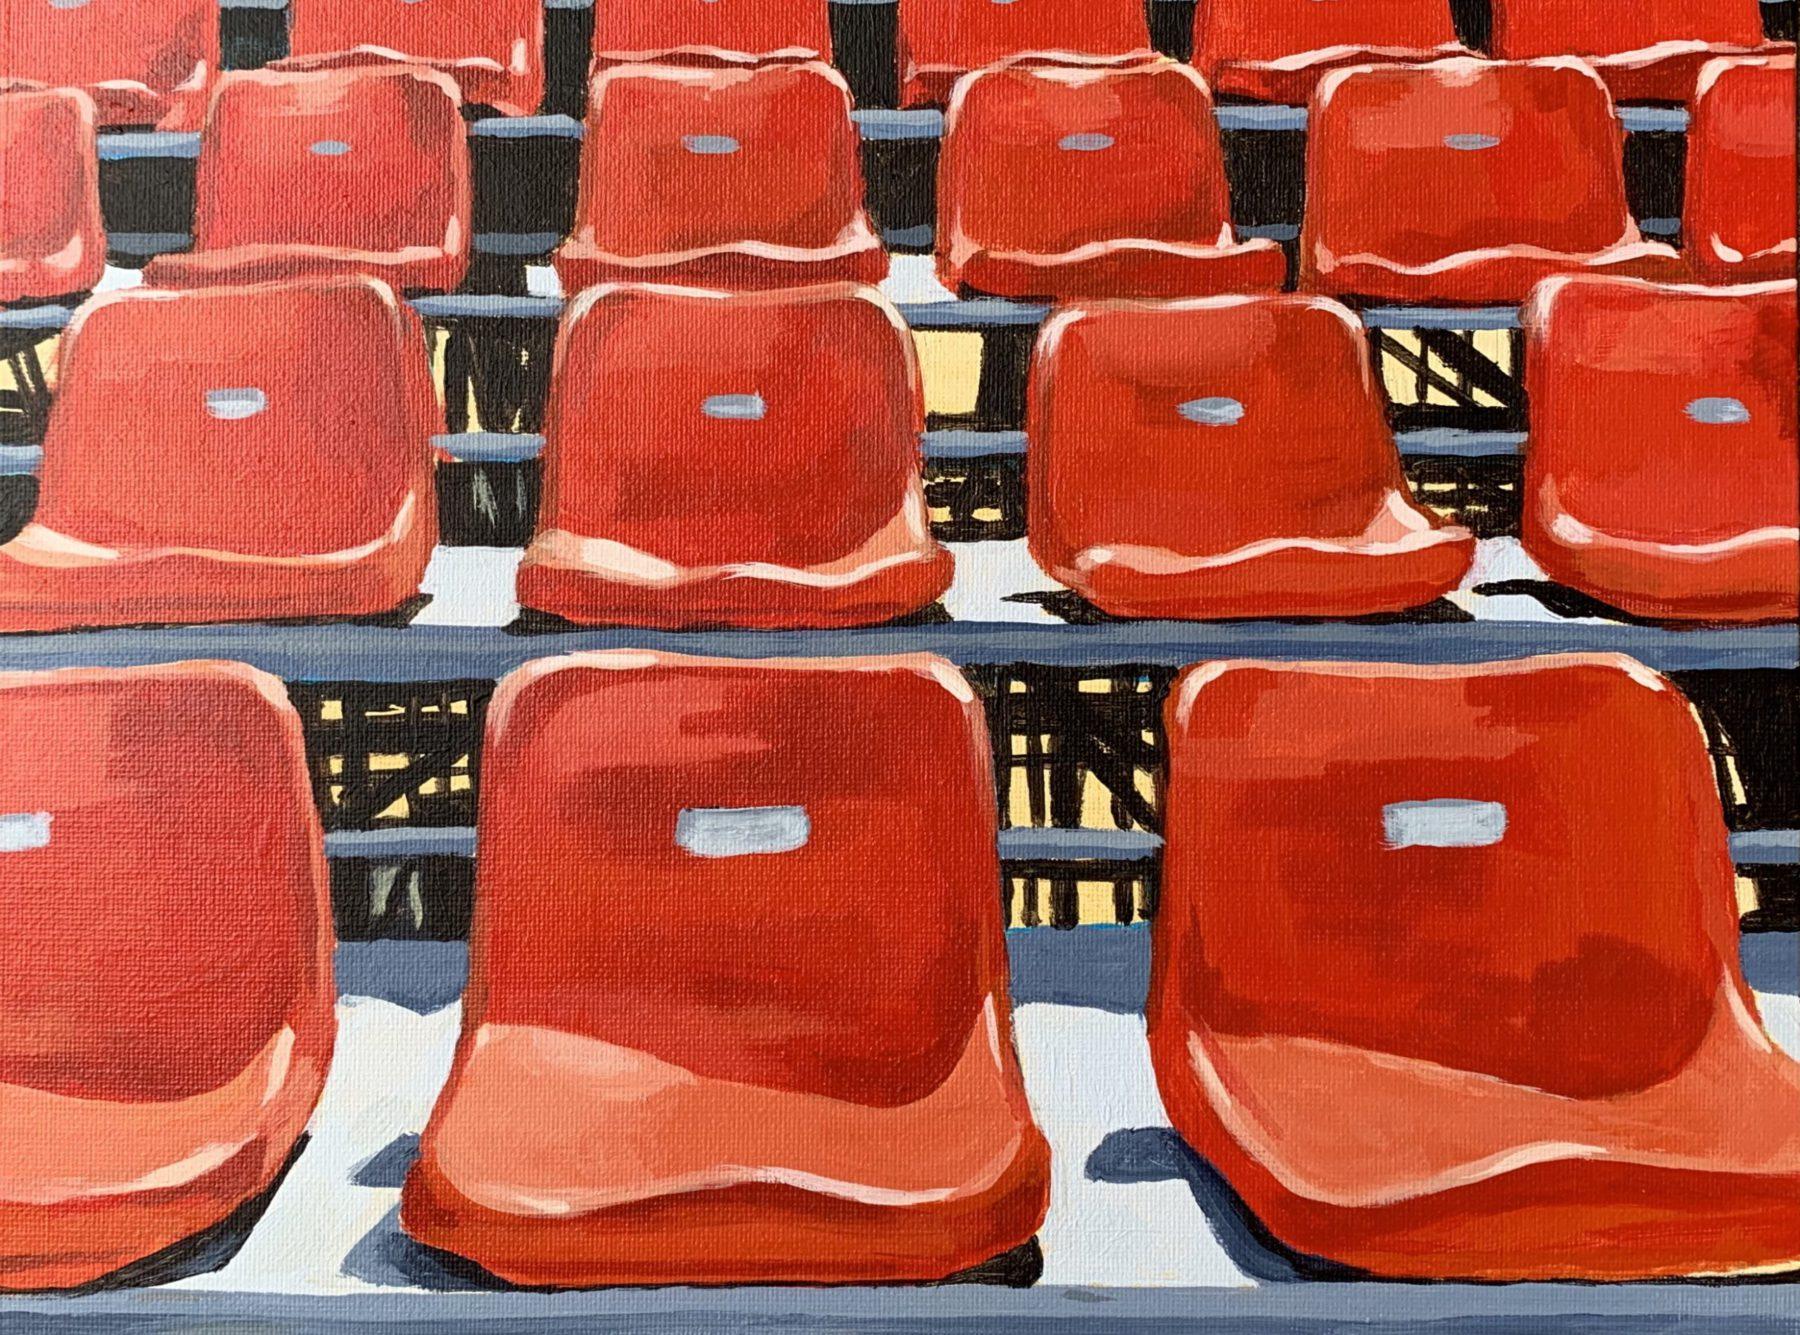 stadium seats, empty stadium seats, leigh ann Torres